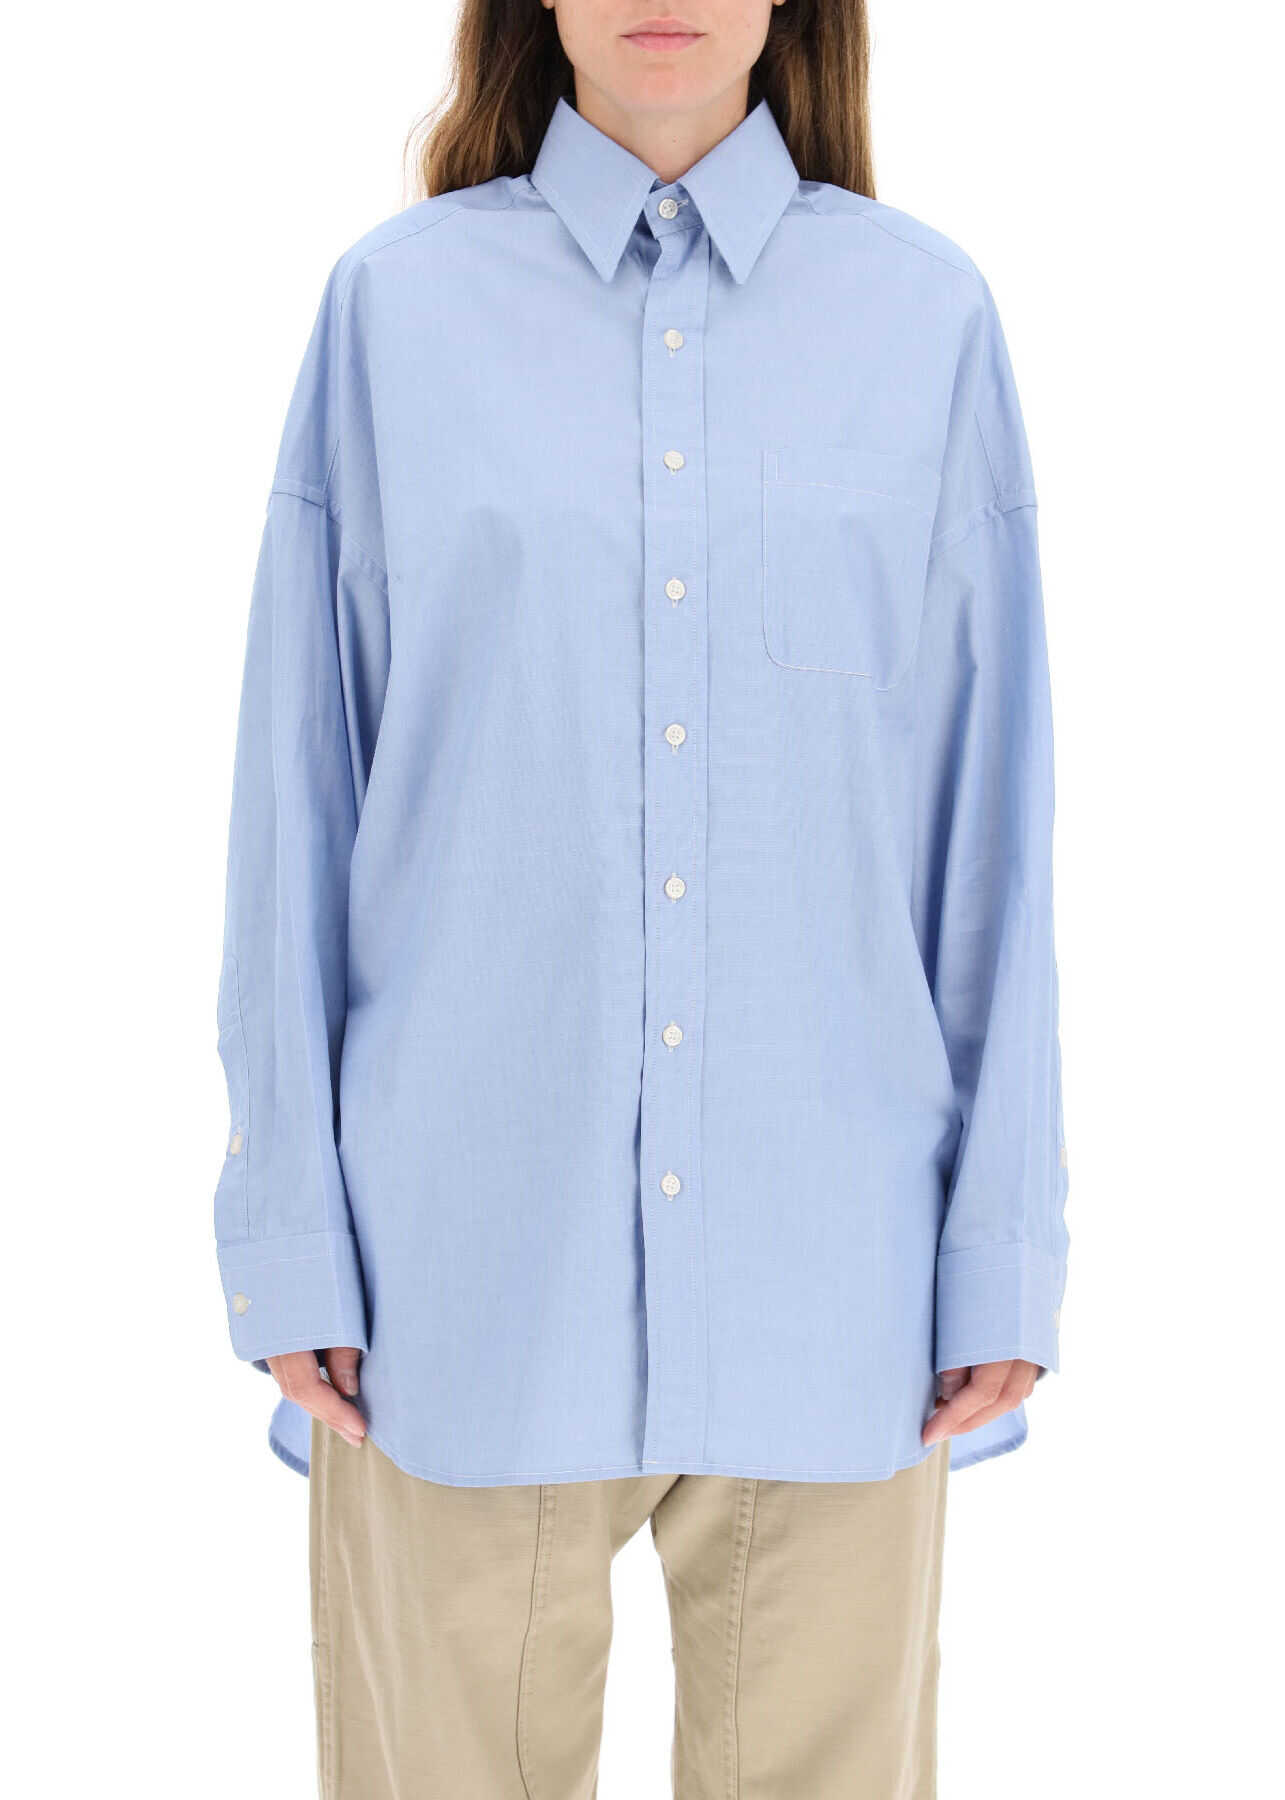 R13 Oxford Oversized Shirt R13W7766C98 LIGHT BLUE image0